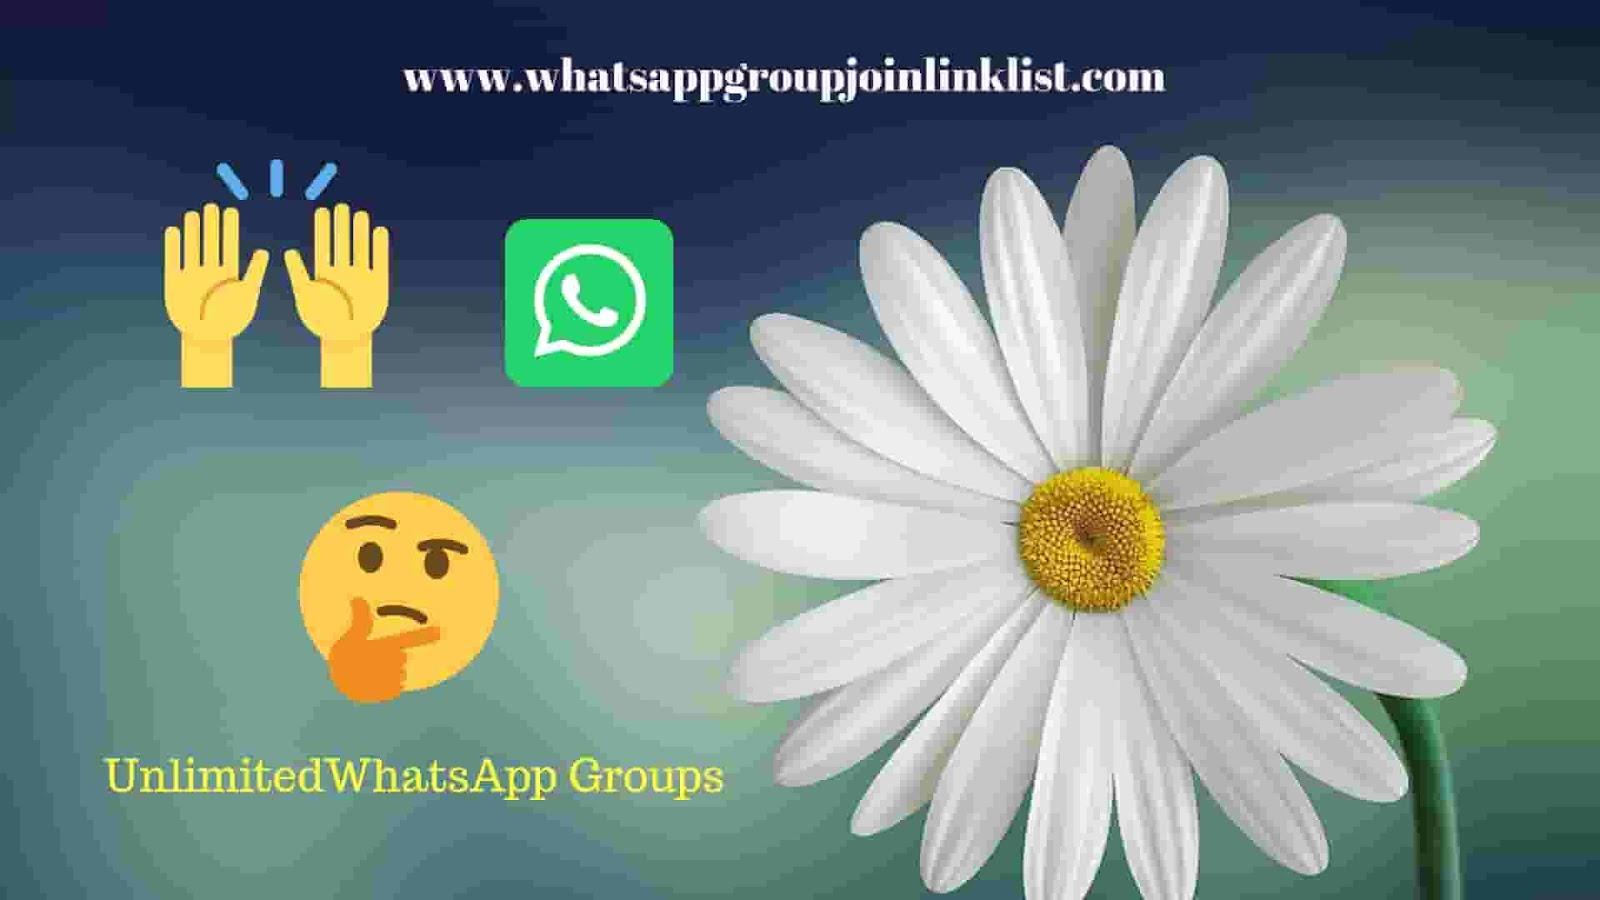 5000+ WHATSAPP GROUP LINKS 2019